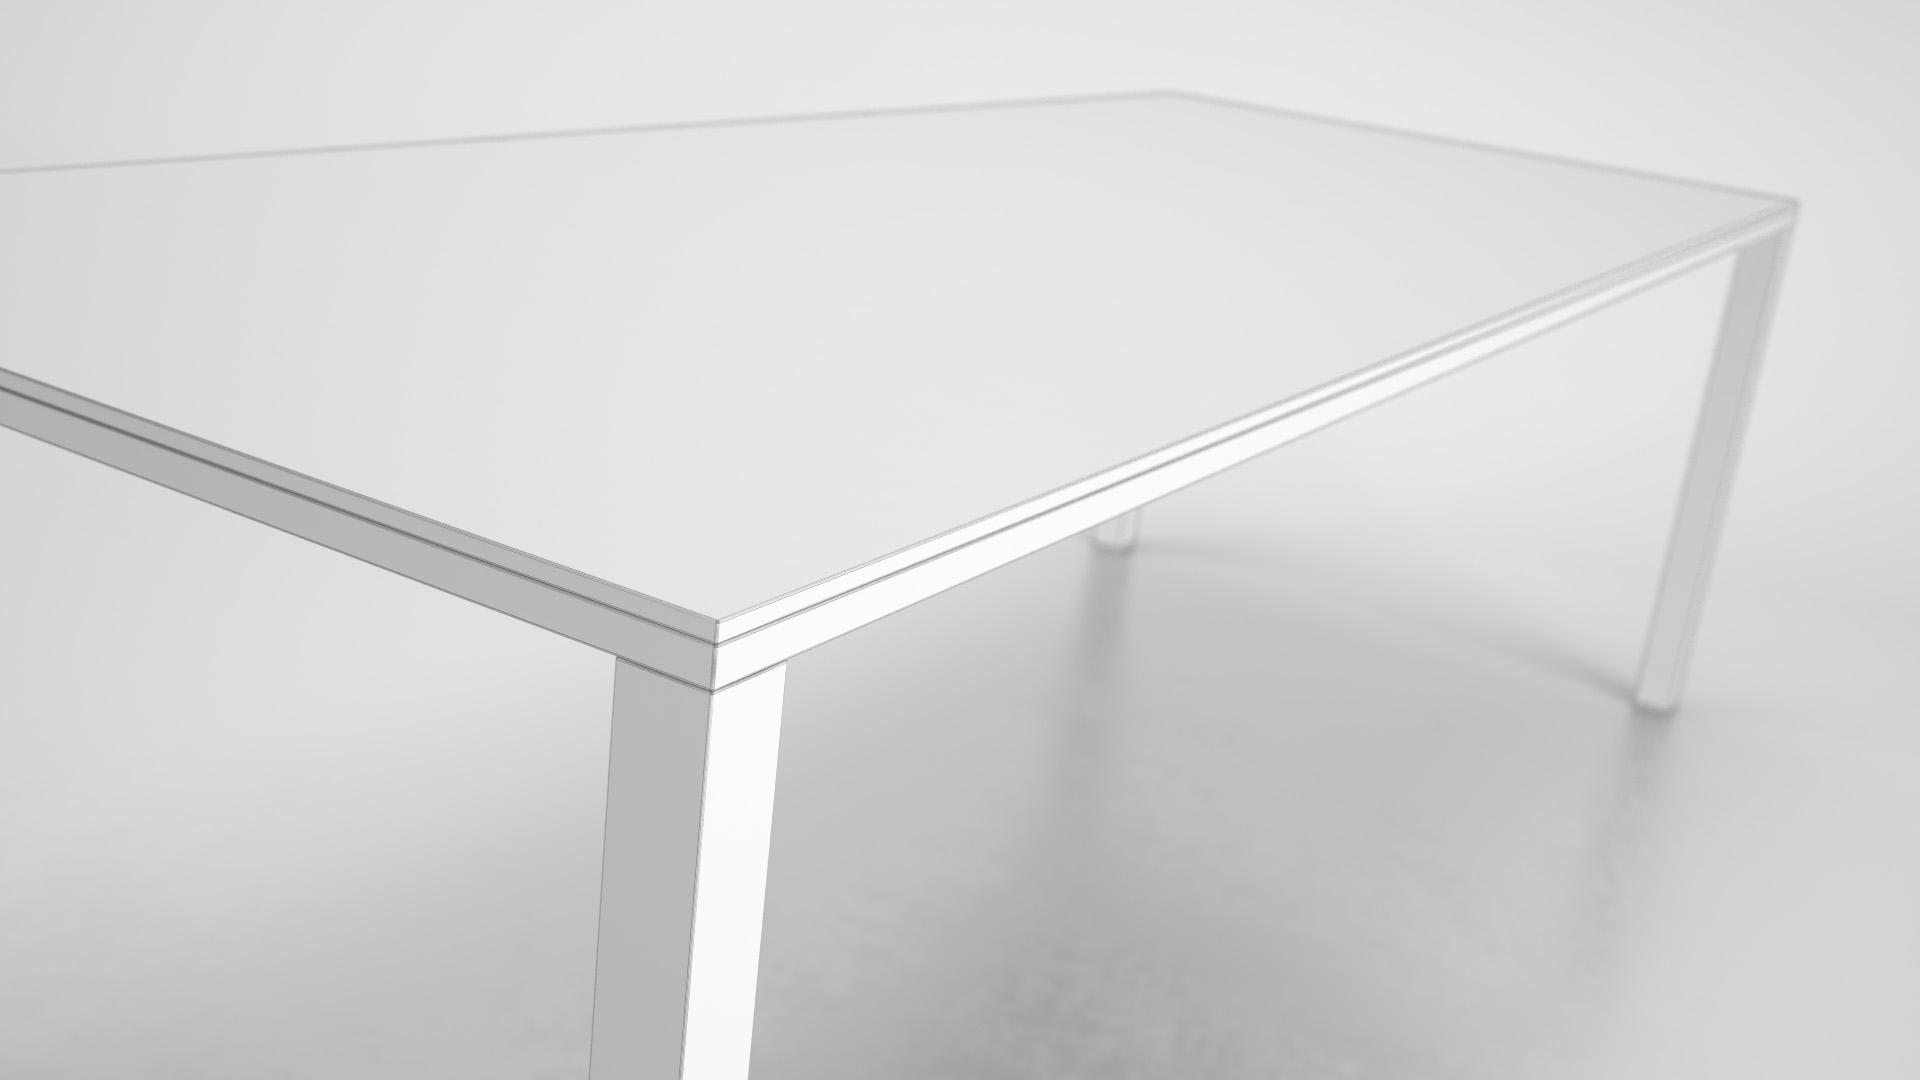 Tribu_Essentiel_Table_WhiteSet_01_wire_0004